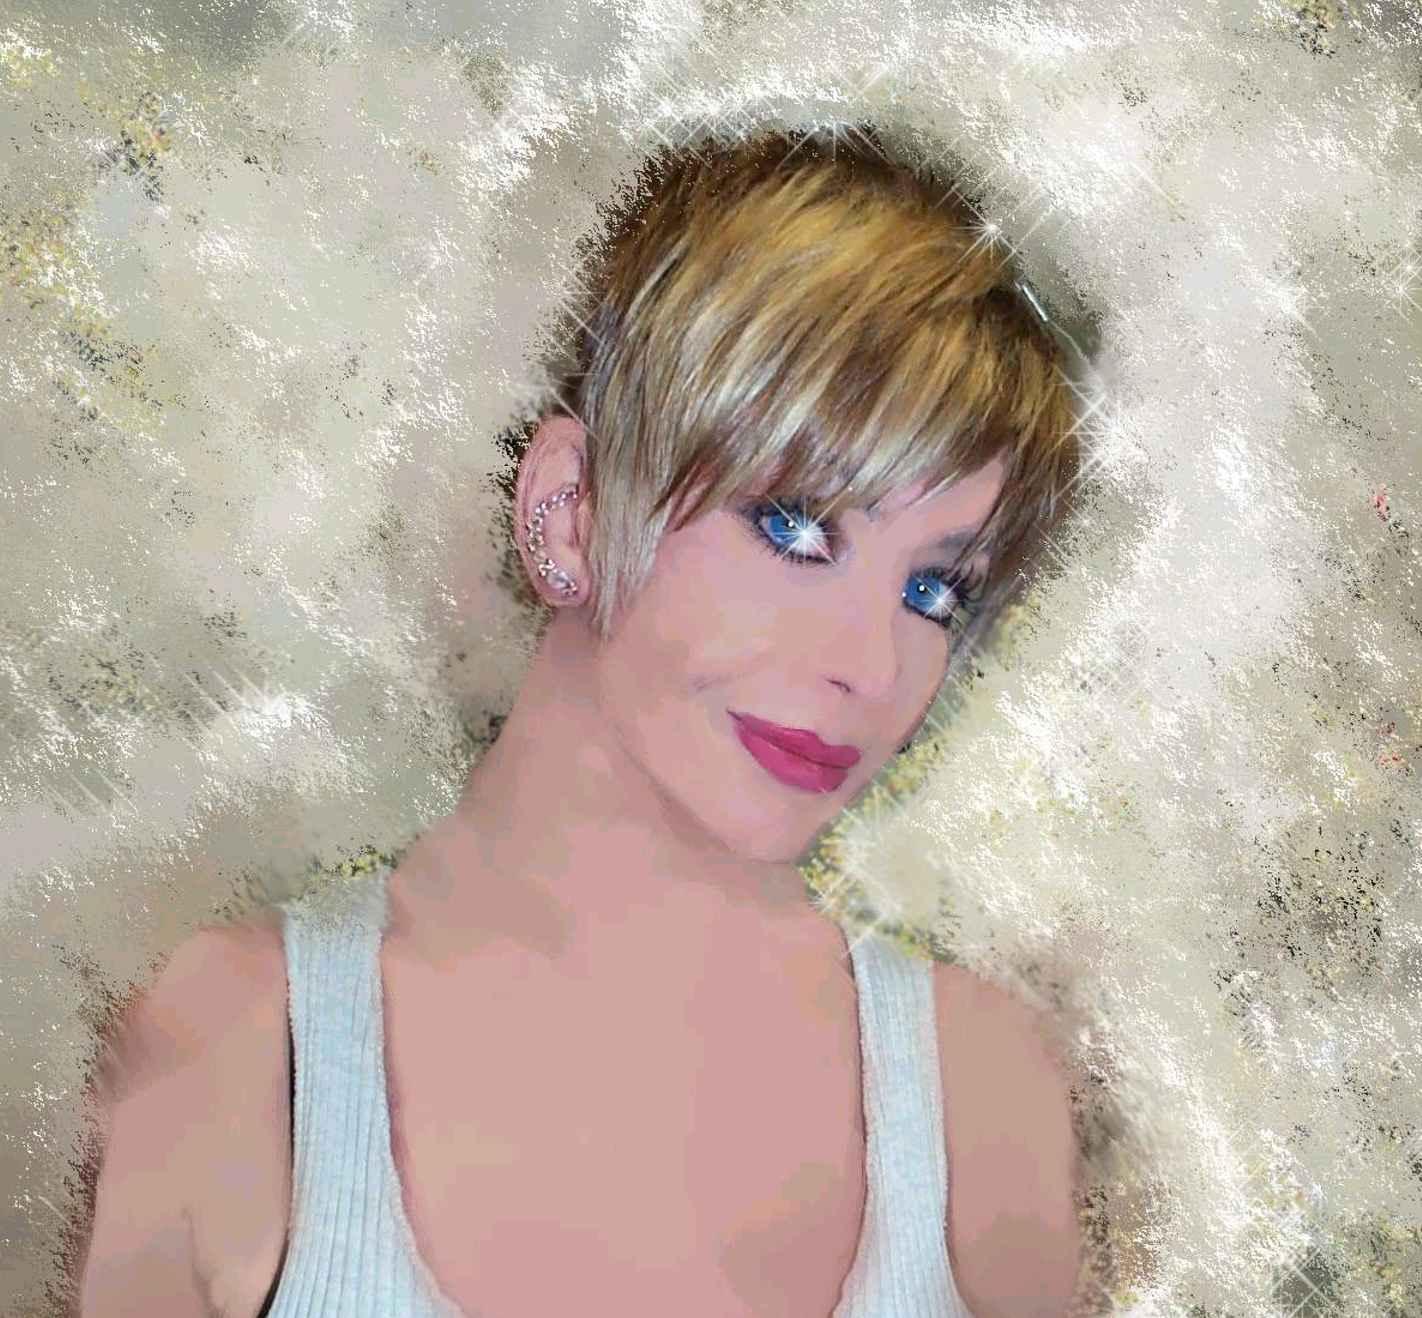 http://4.bp.blogspot.com/-p6obpP9sow8/UH9ktGz_R6I/AAAAAAAAAEk/_aXEwtD6sns/s1600/portrait+Claudia.jpg